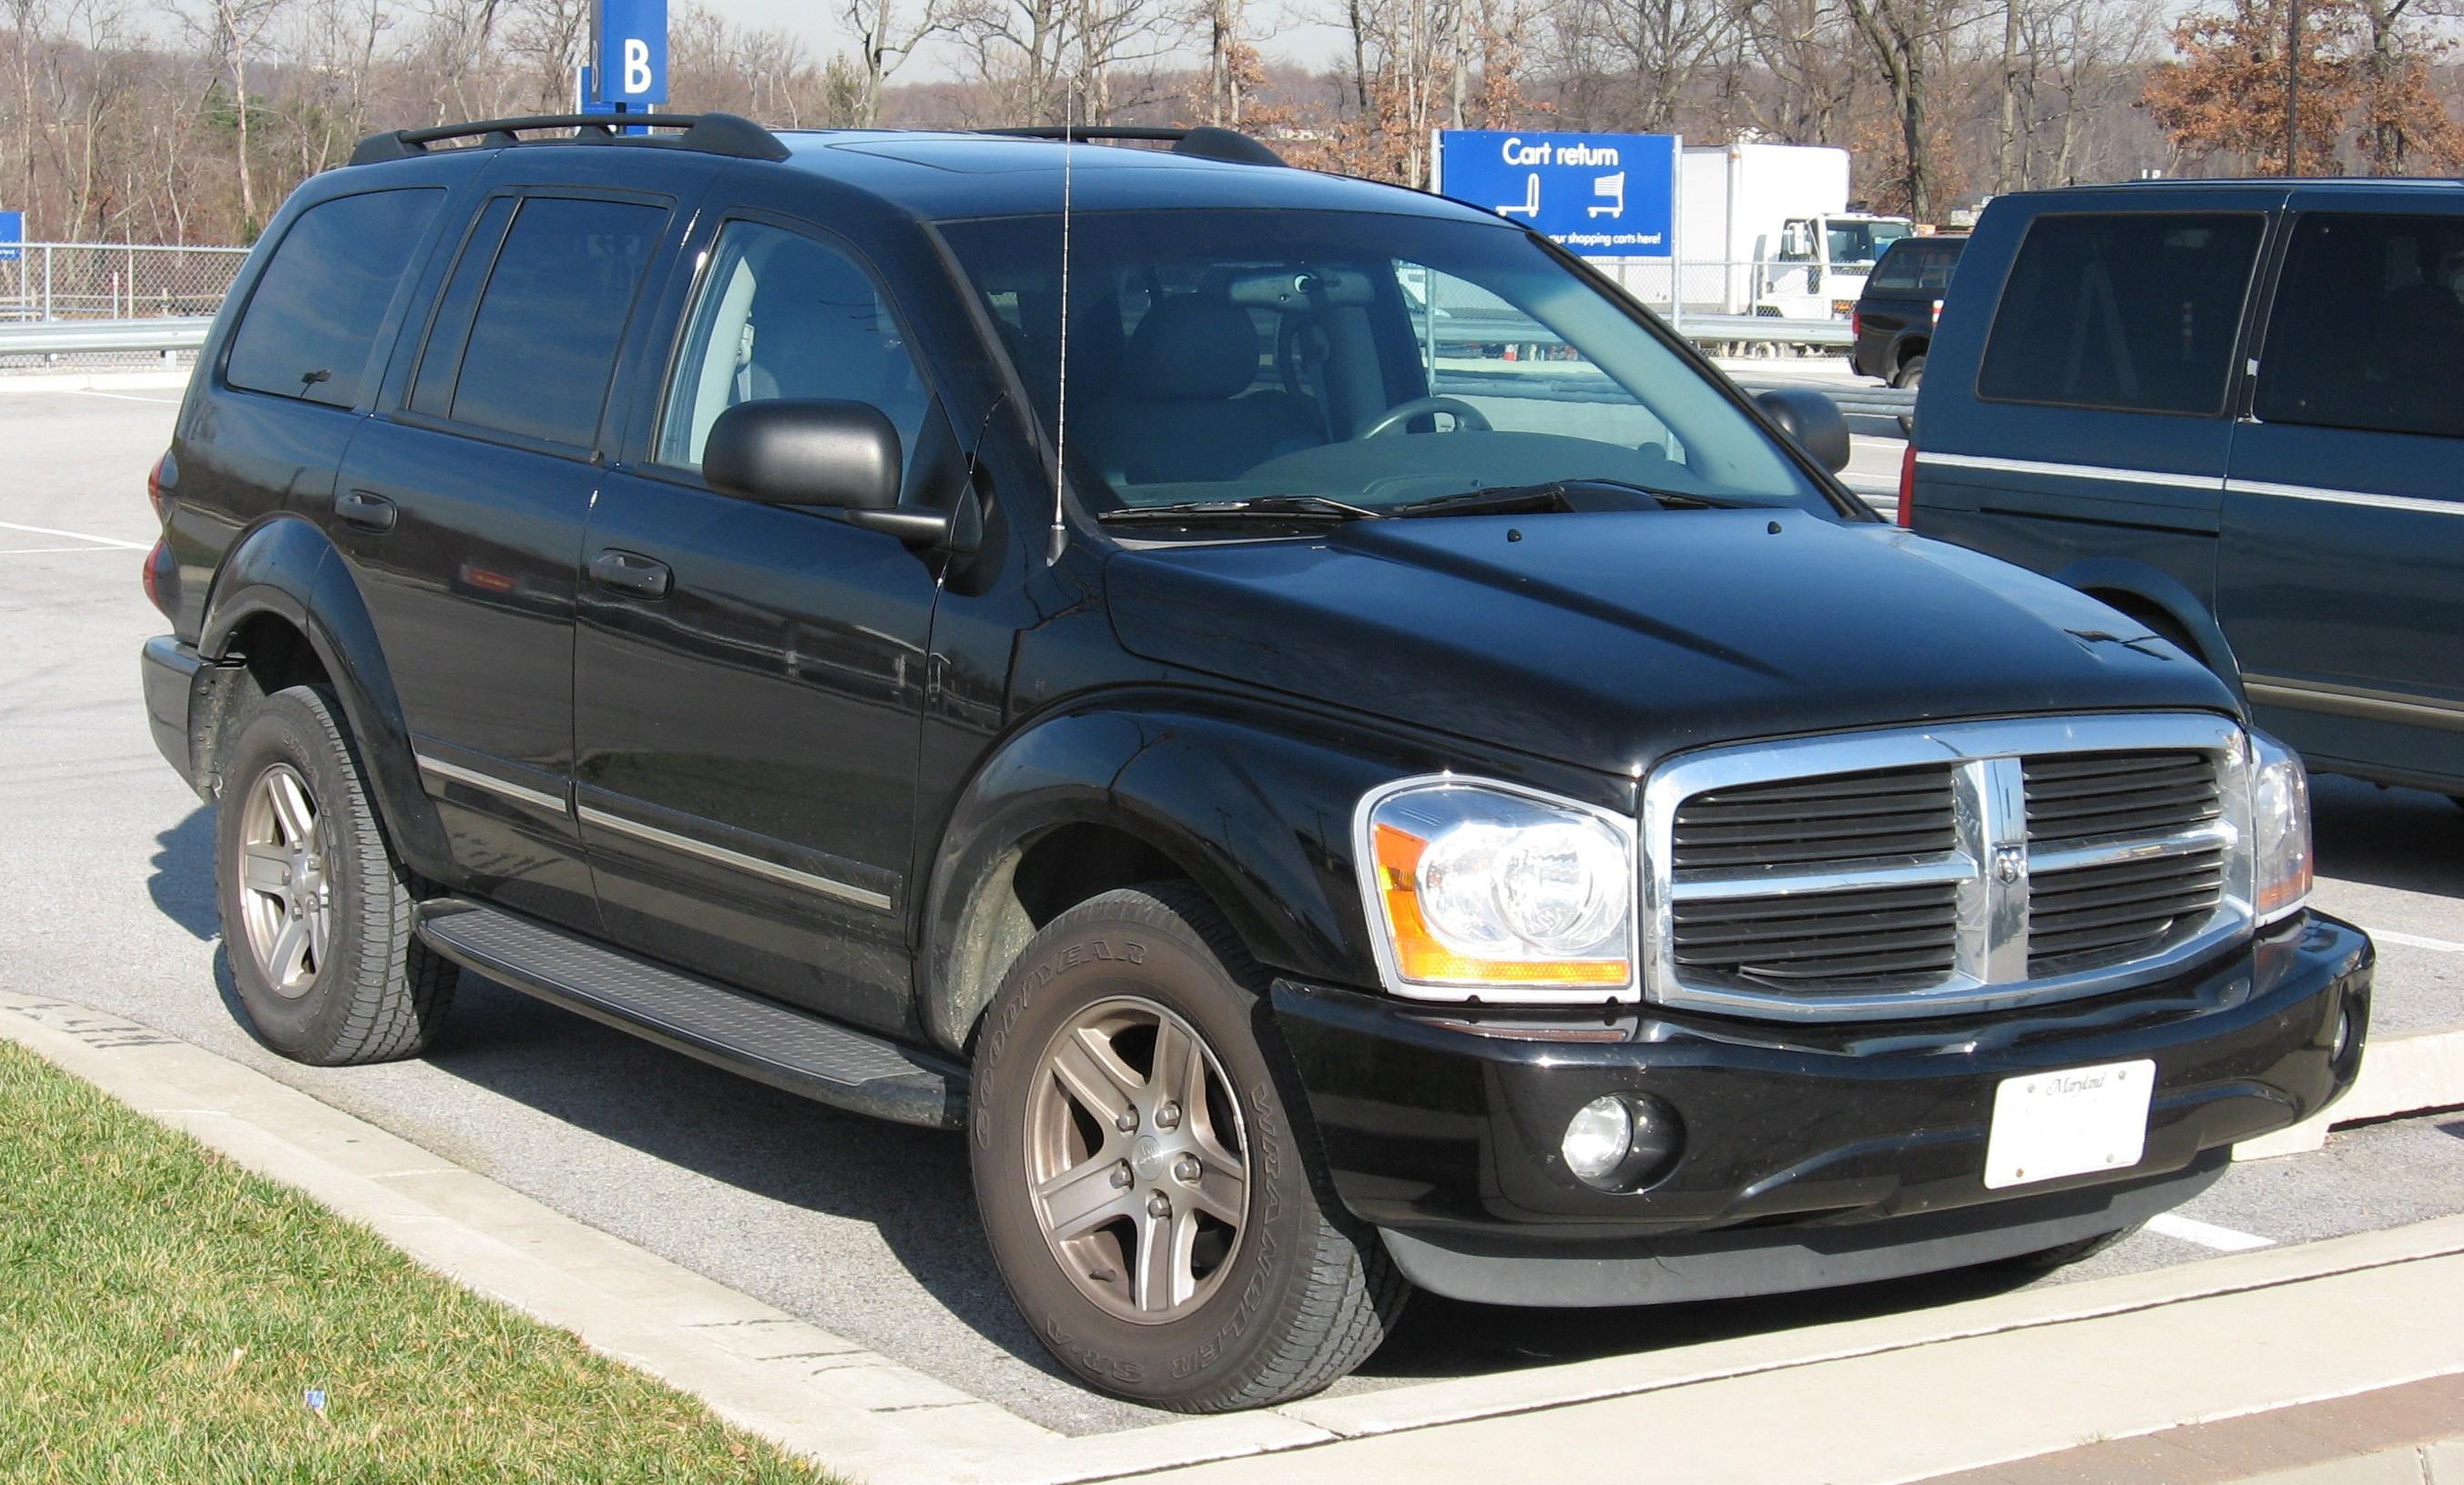 2006 Dodge Durango Image 21